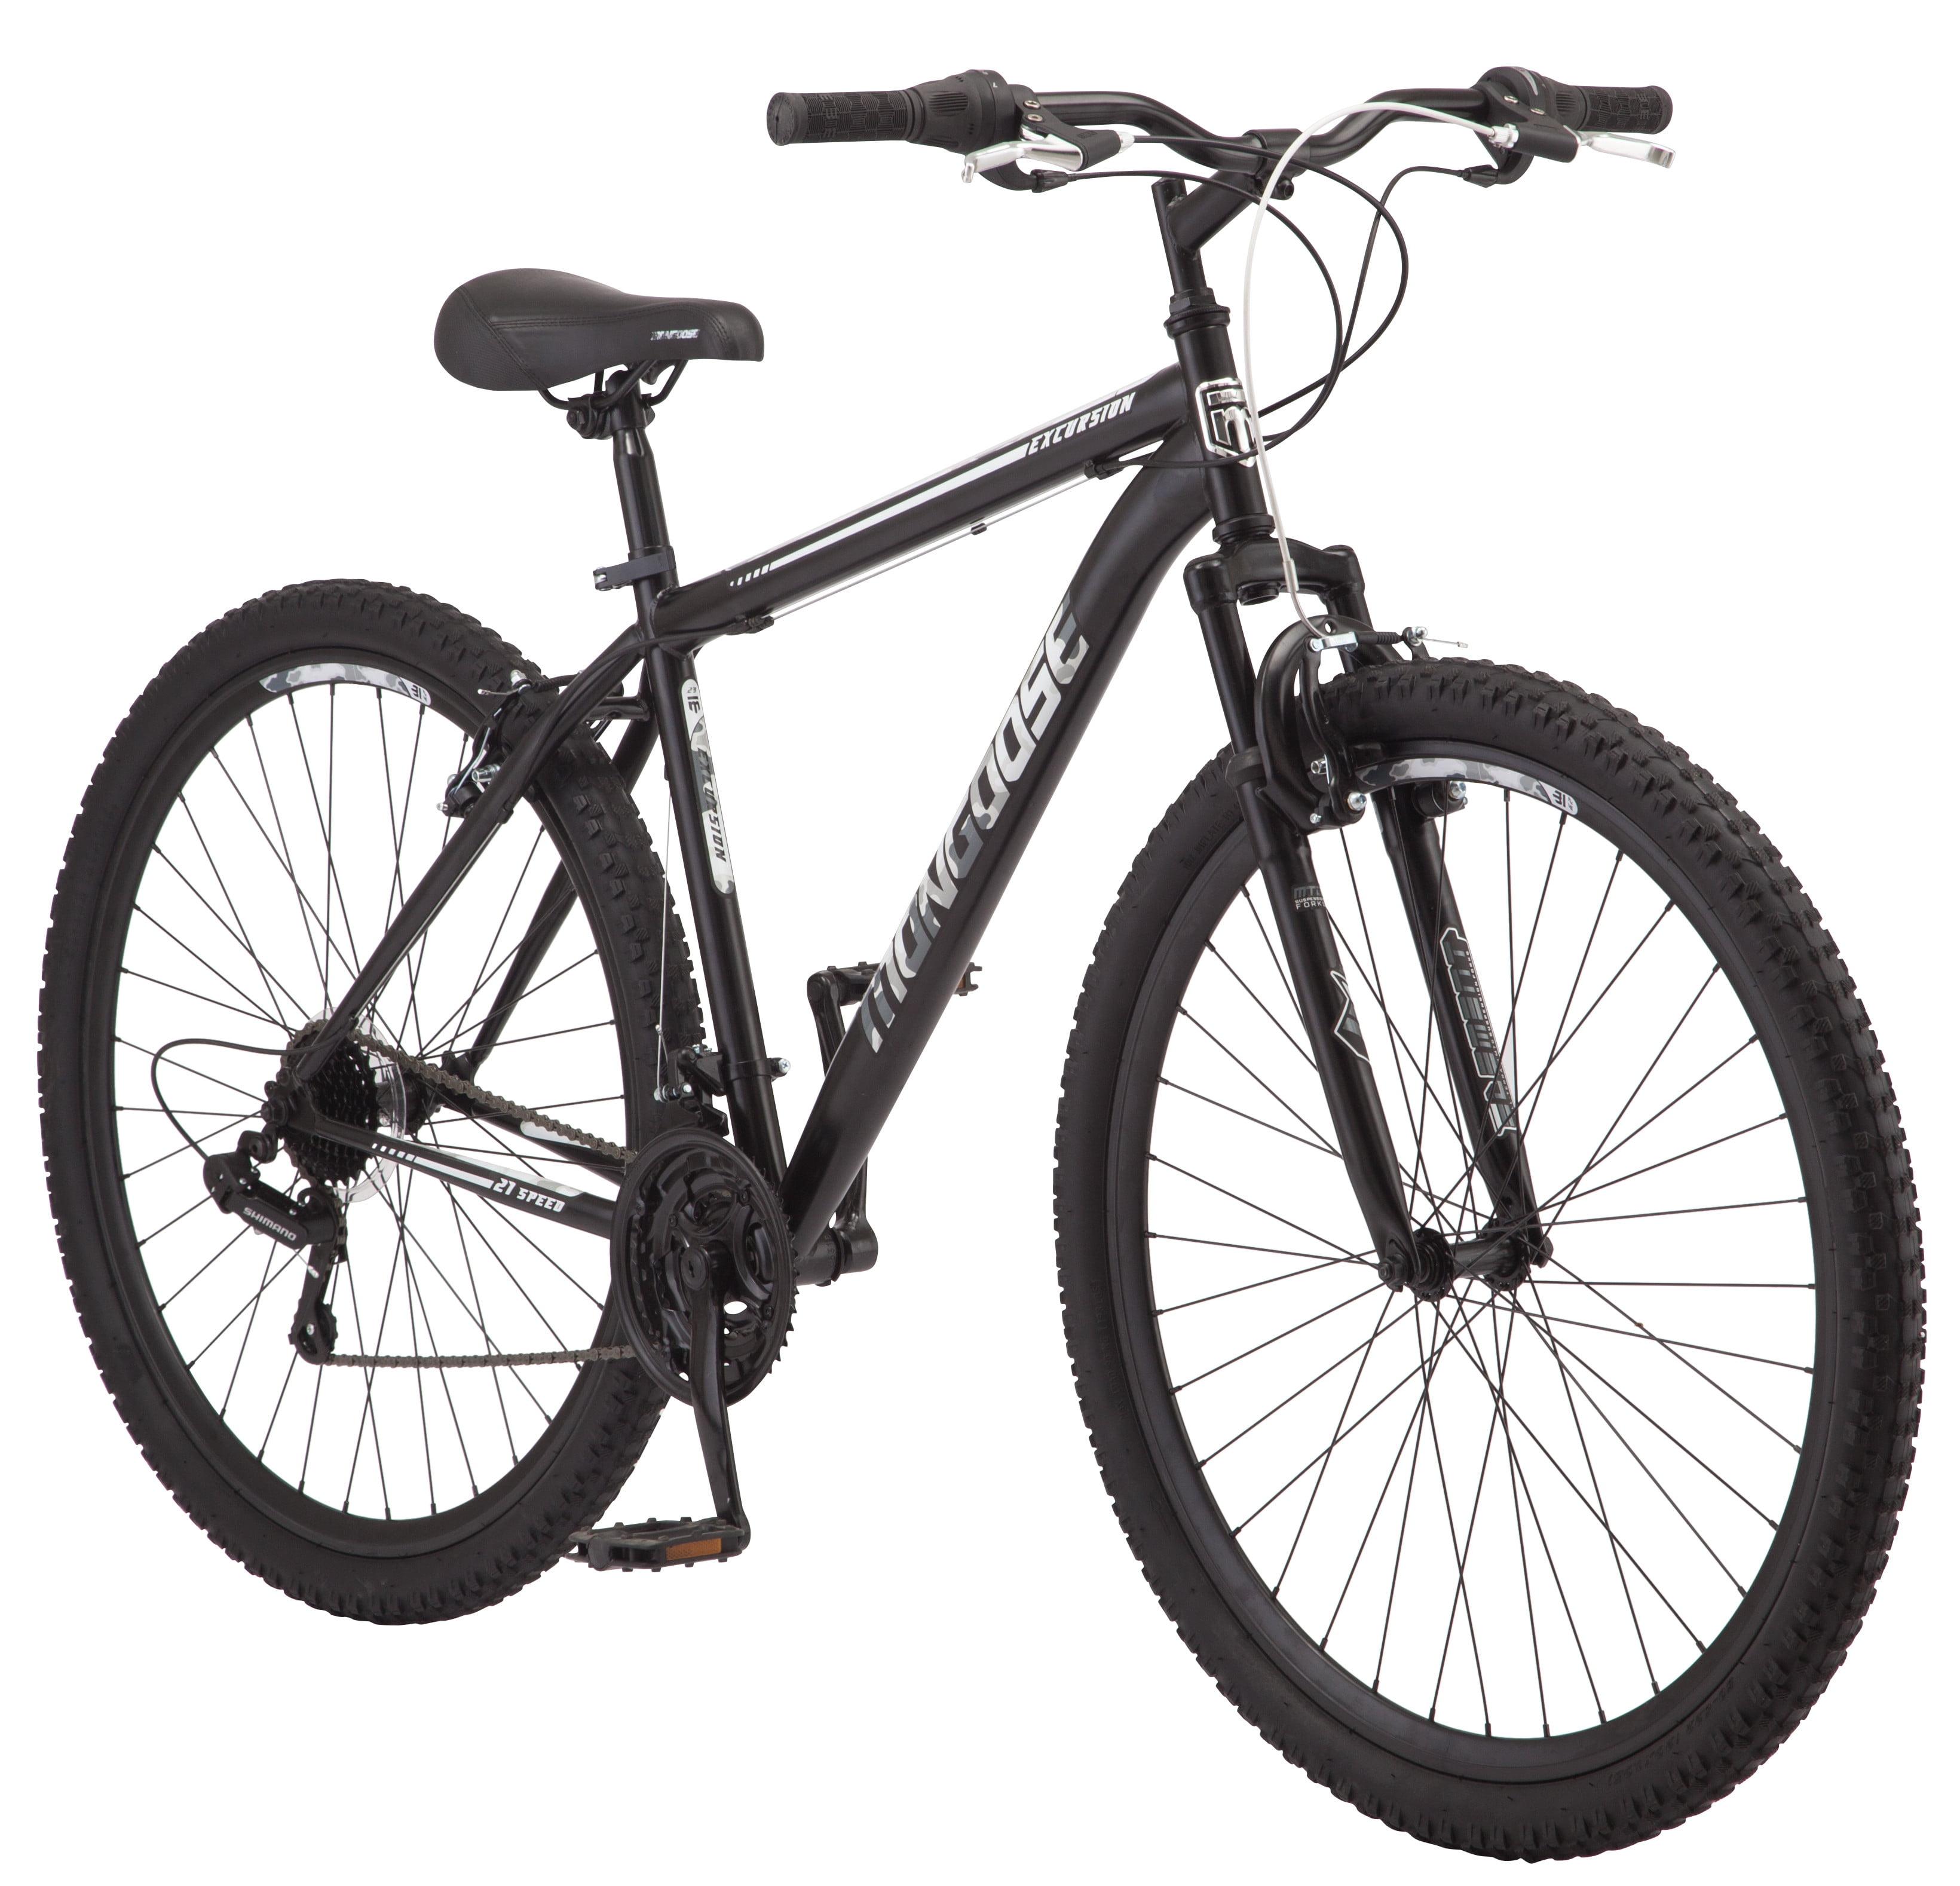 "Mongoose 29"" Excursion Men's Mountain Bike, Black"